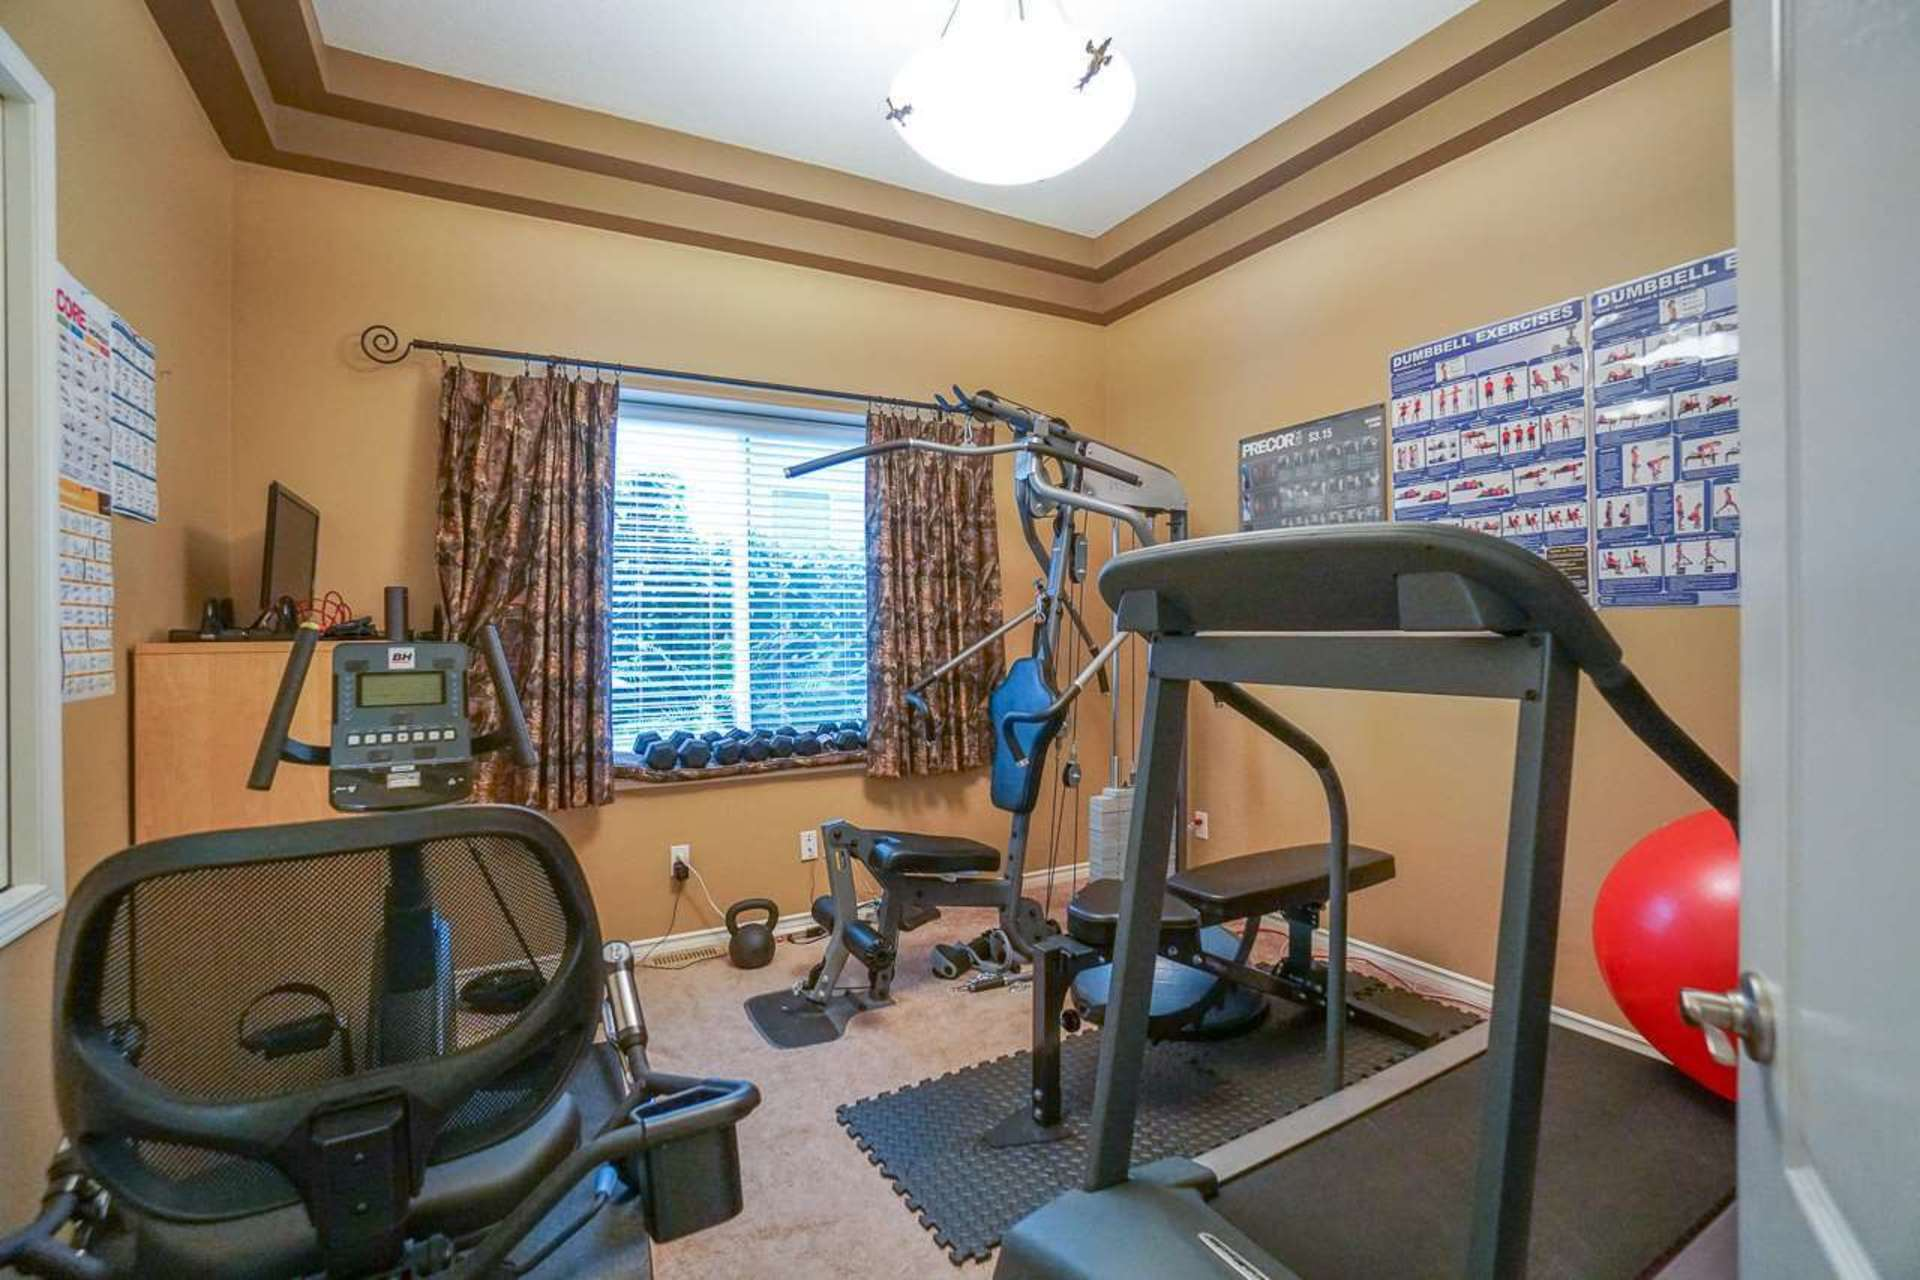 541-linton-street-central-coquitlam-coquitlam-17 of 541 Linton Street, Central Coquitlam, Coquitlam